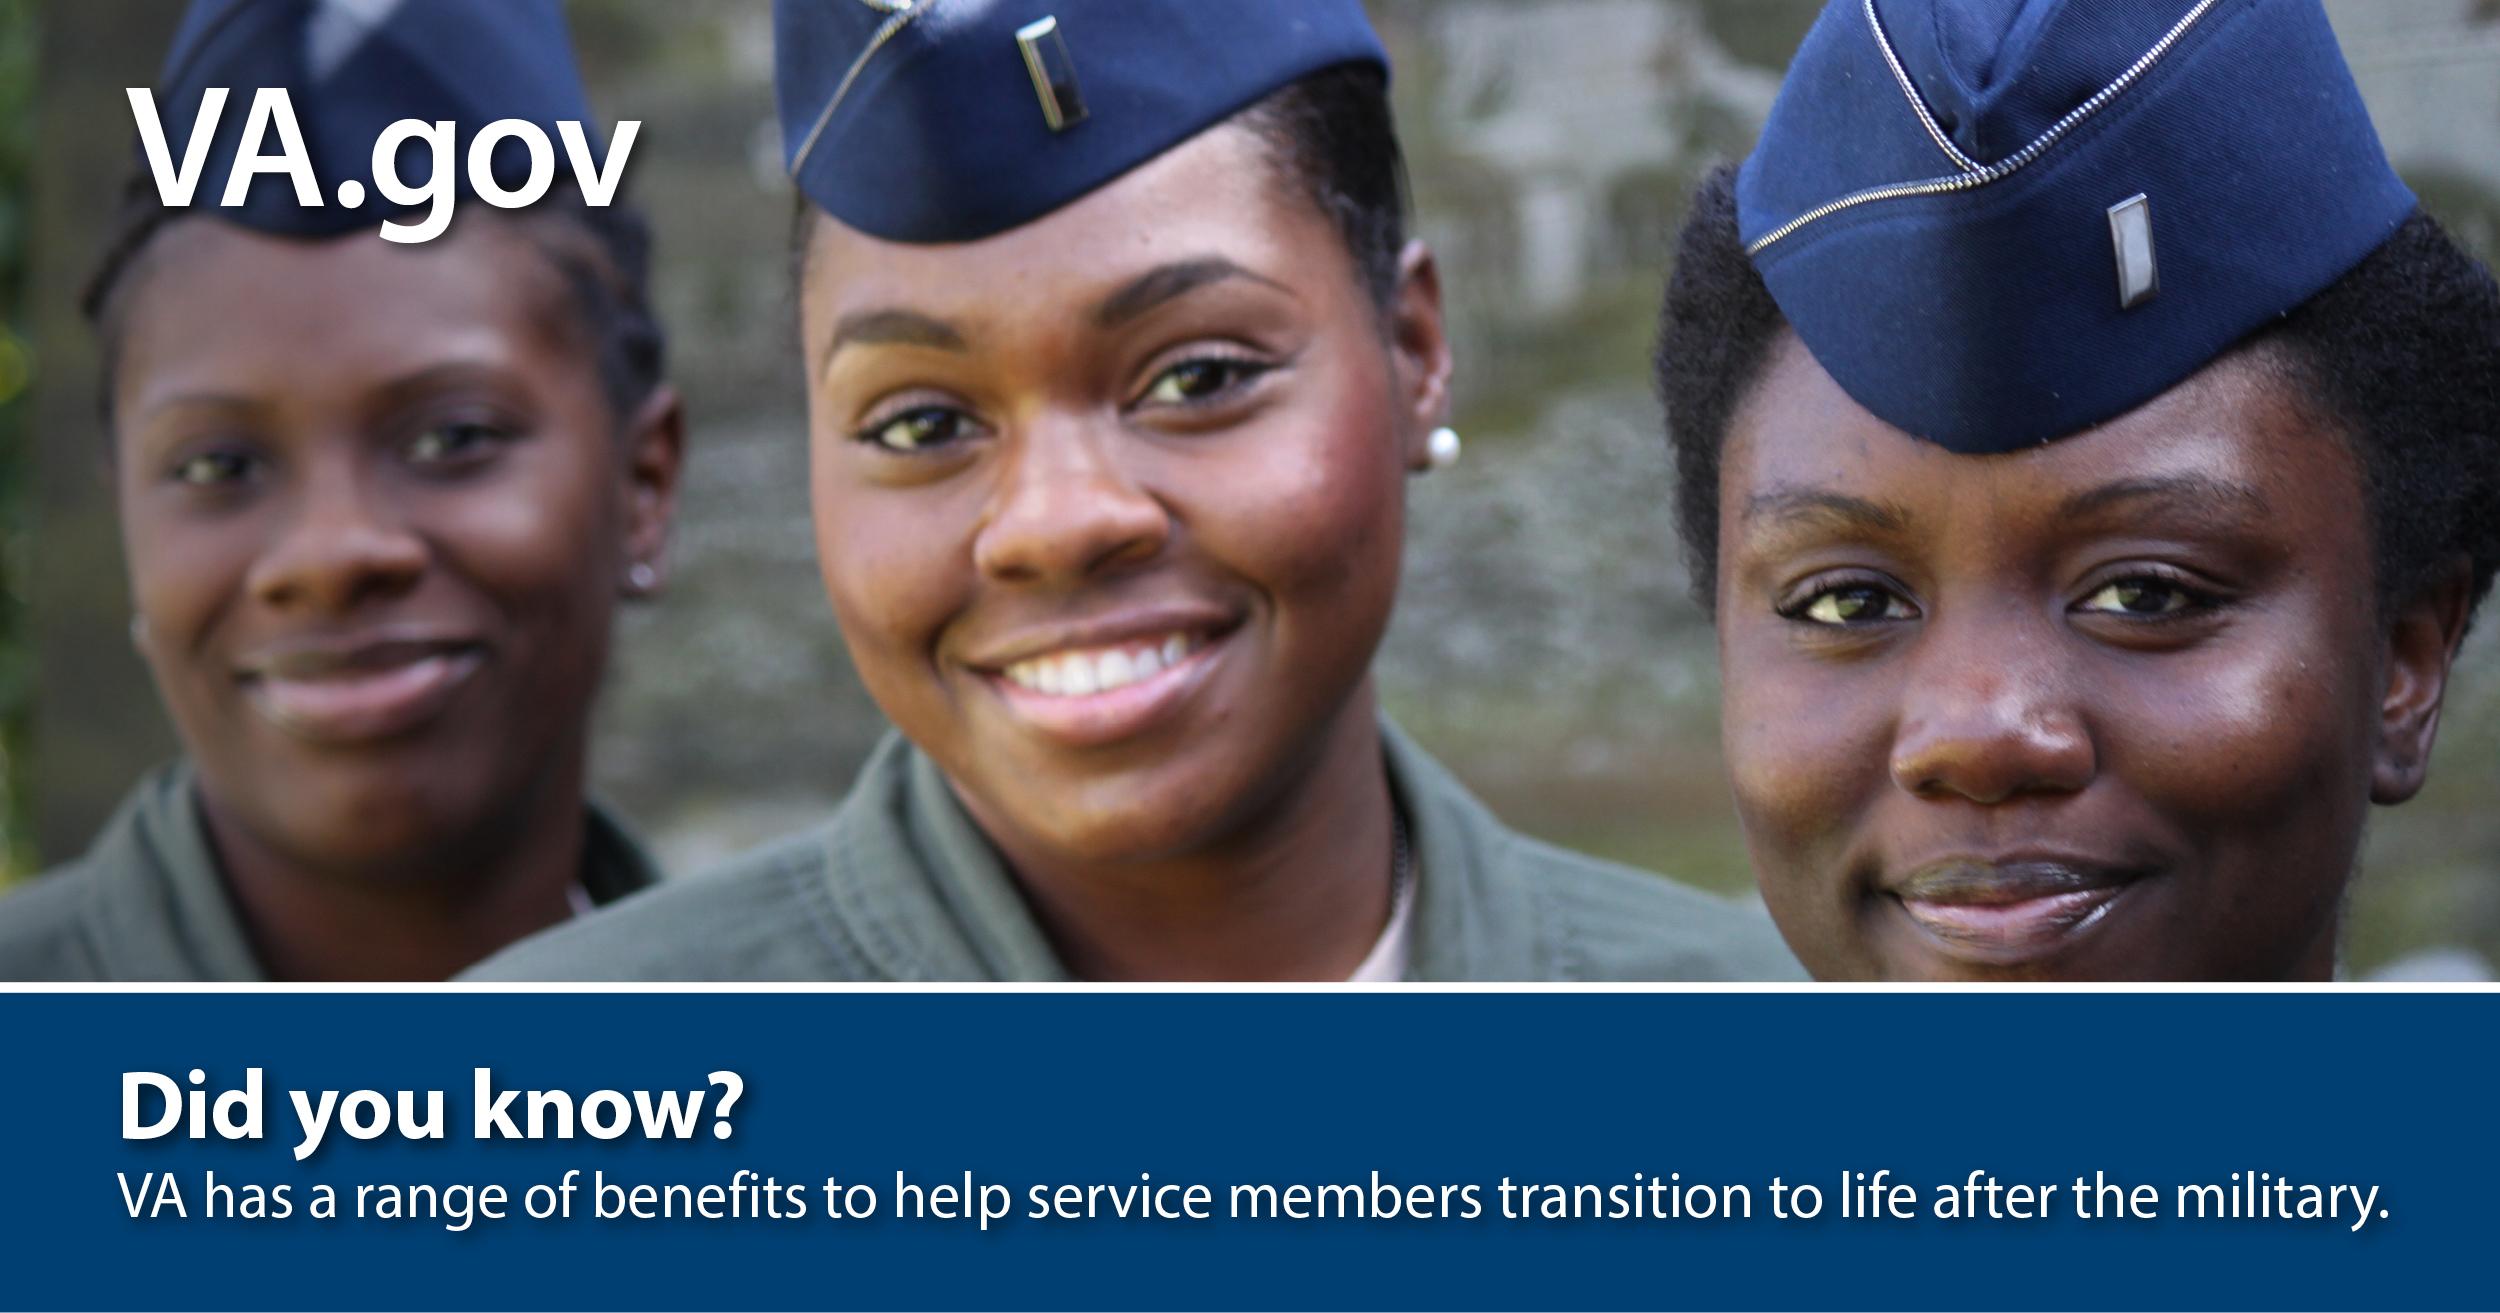 VA benefits help with post-military life